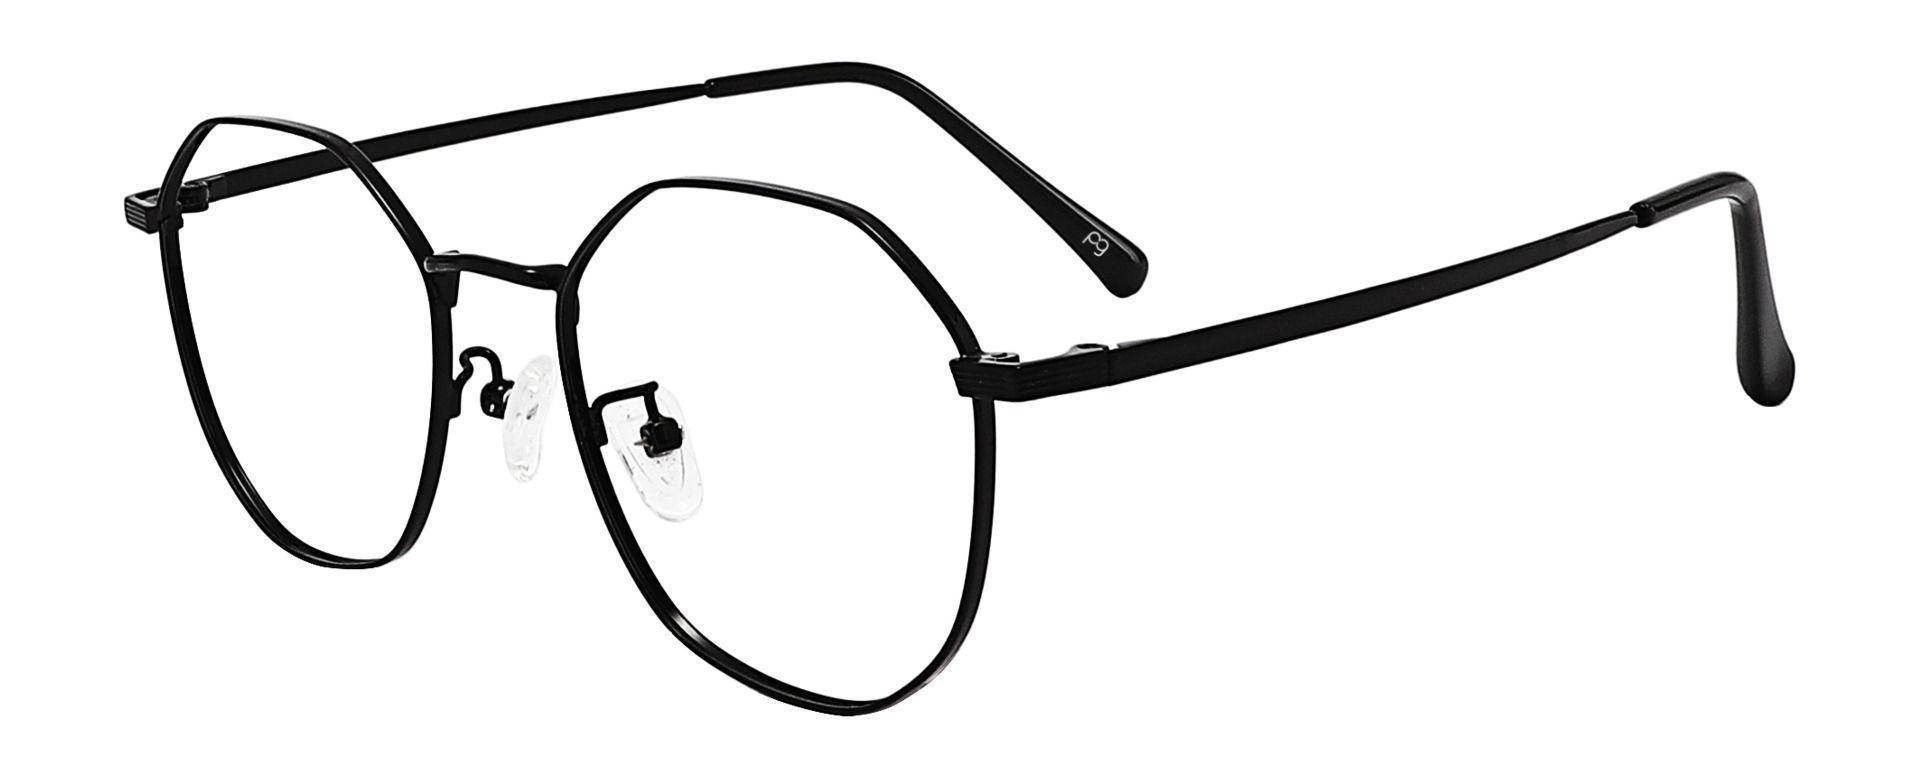 Cobb Geometric Prescription Glasses - Black